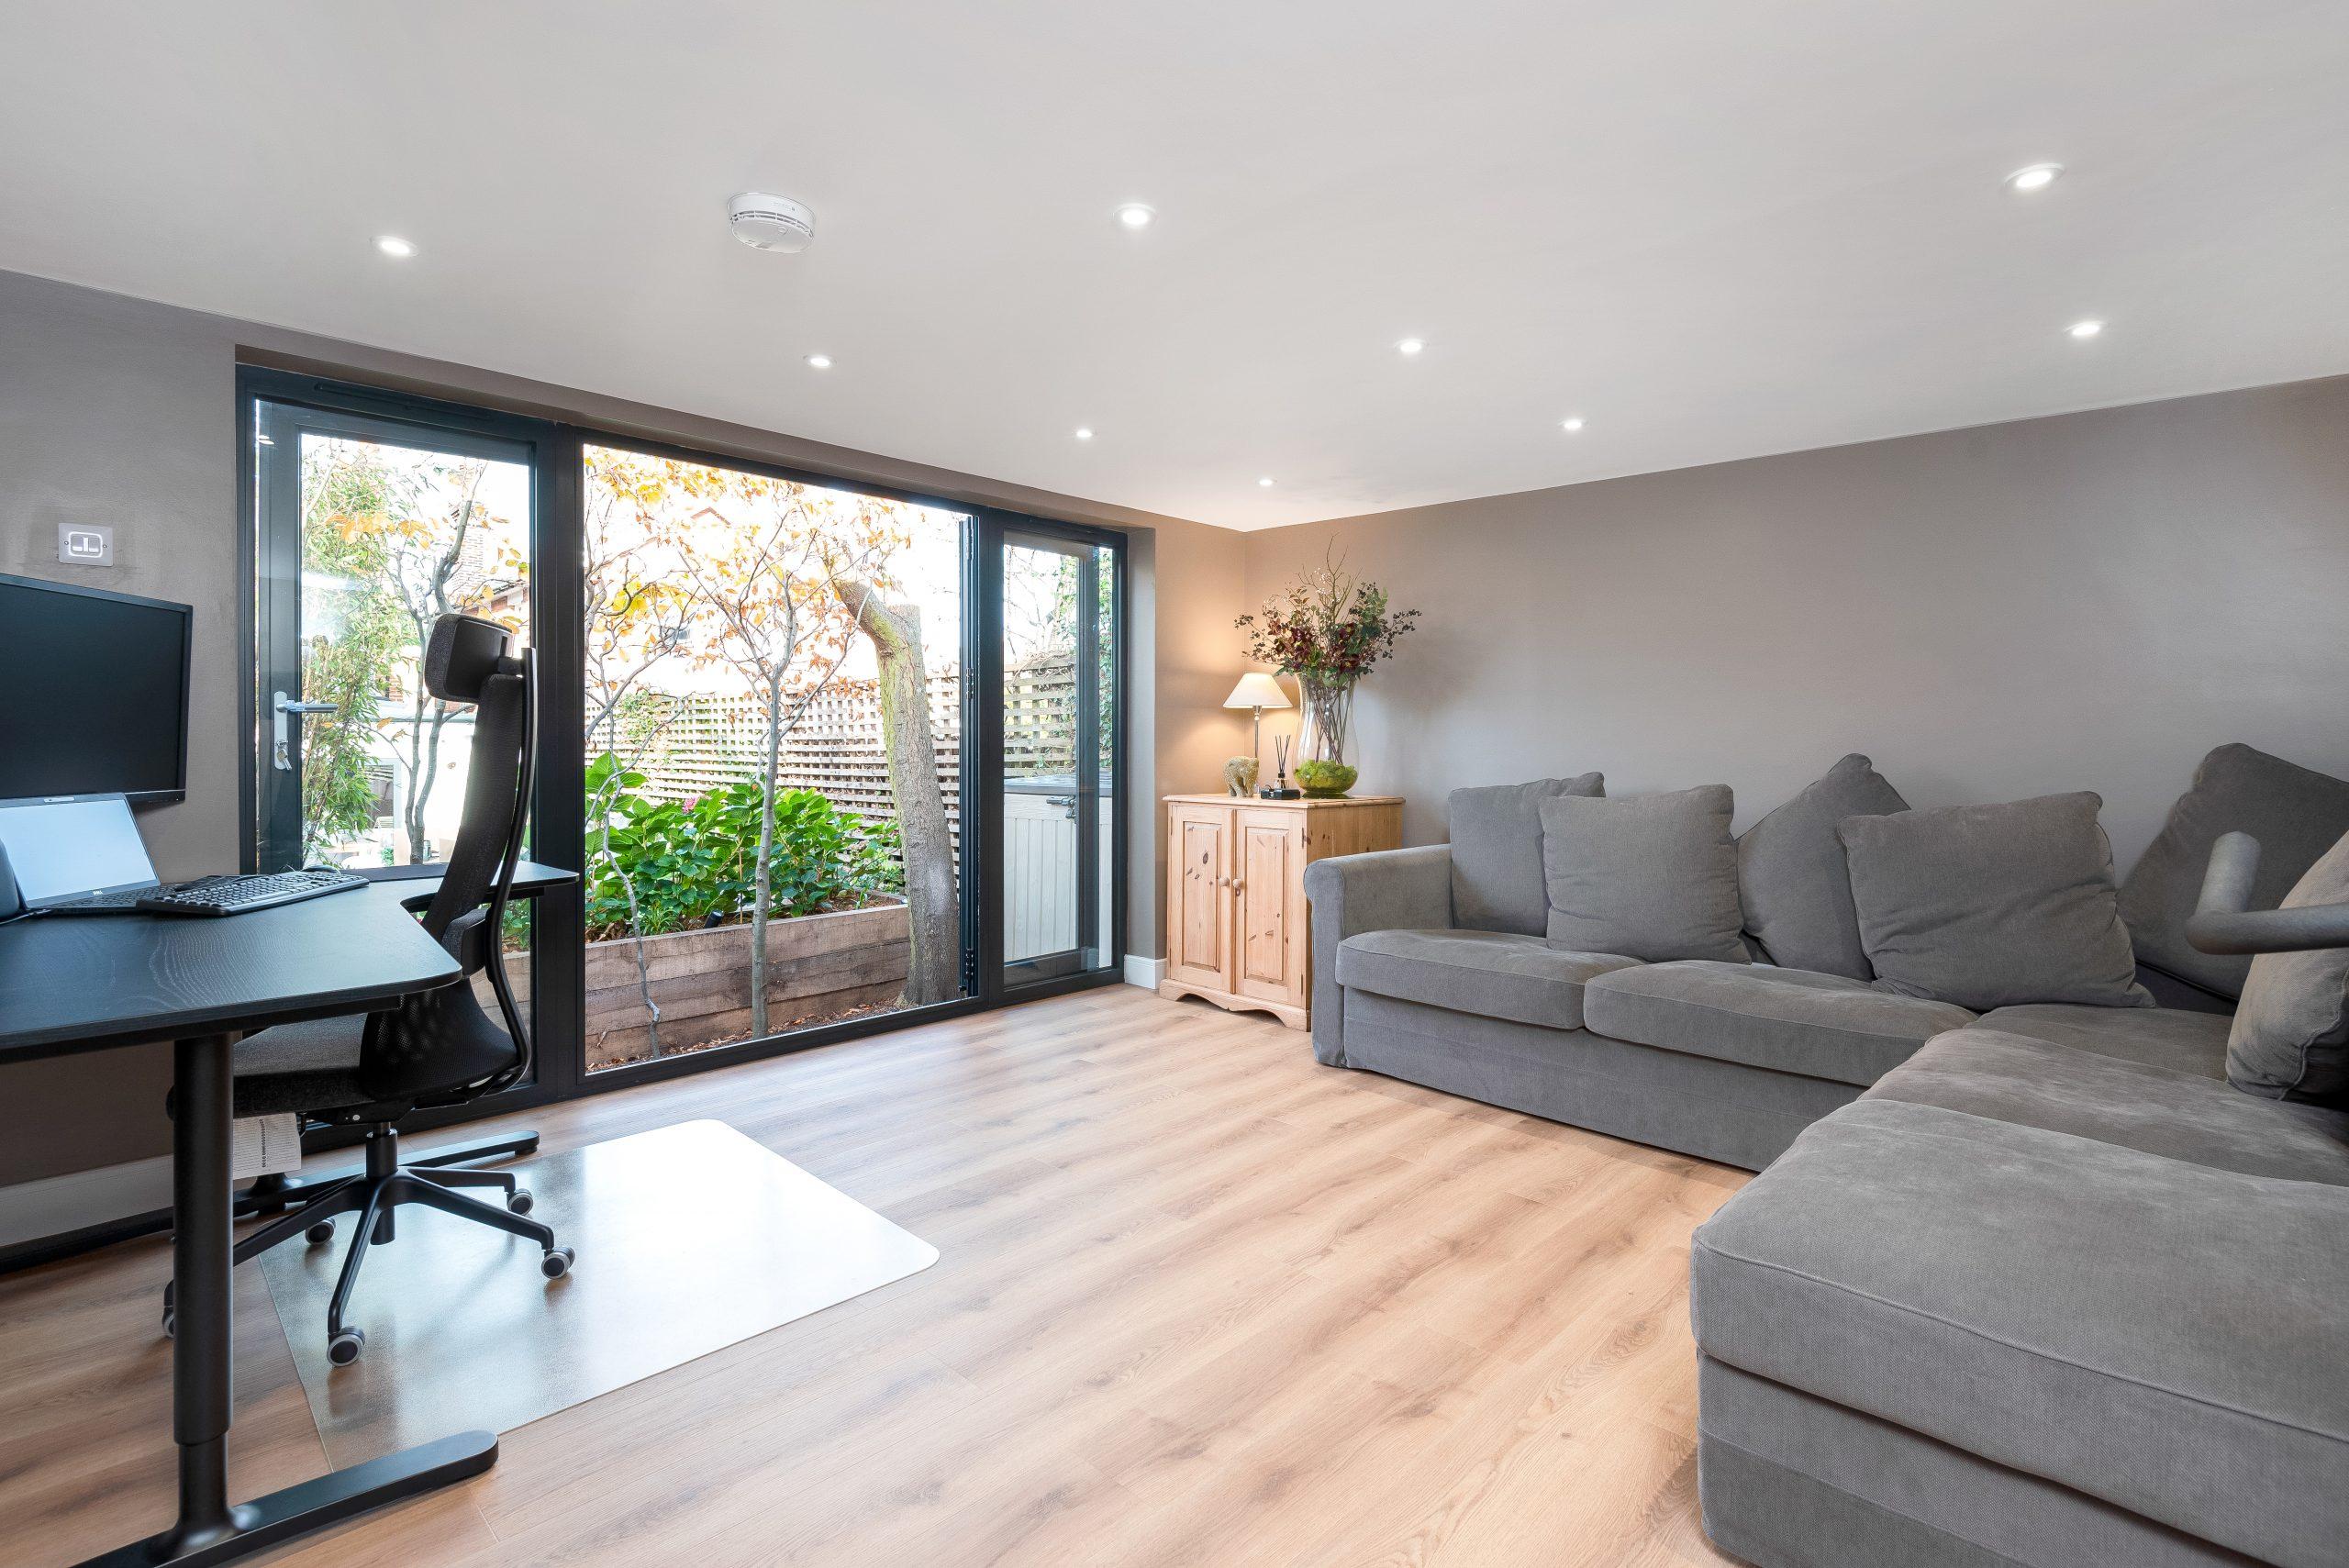 Contemporary living area in garden room